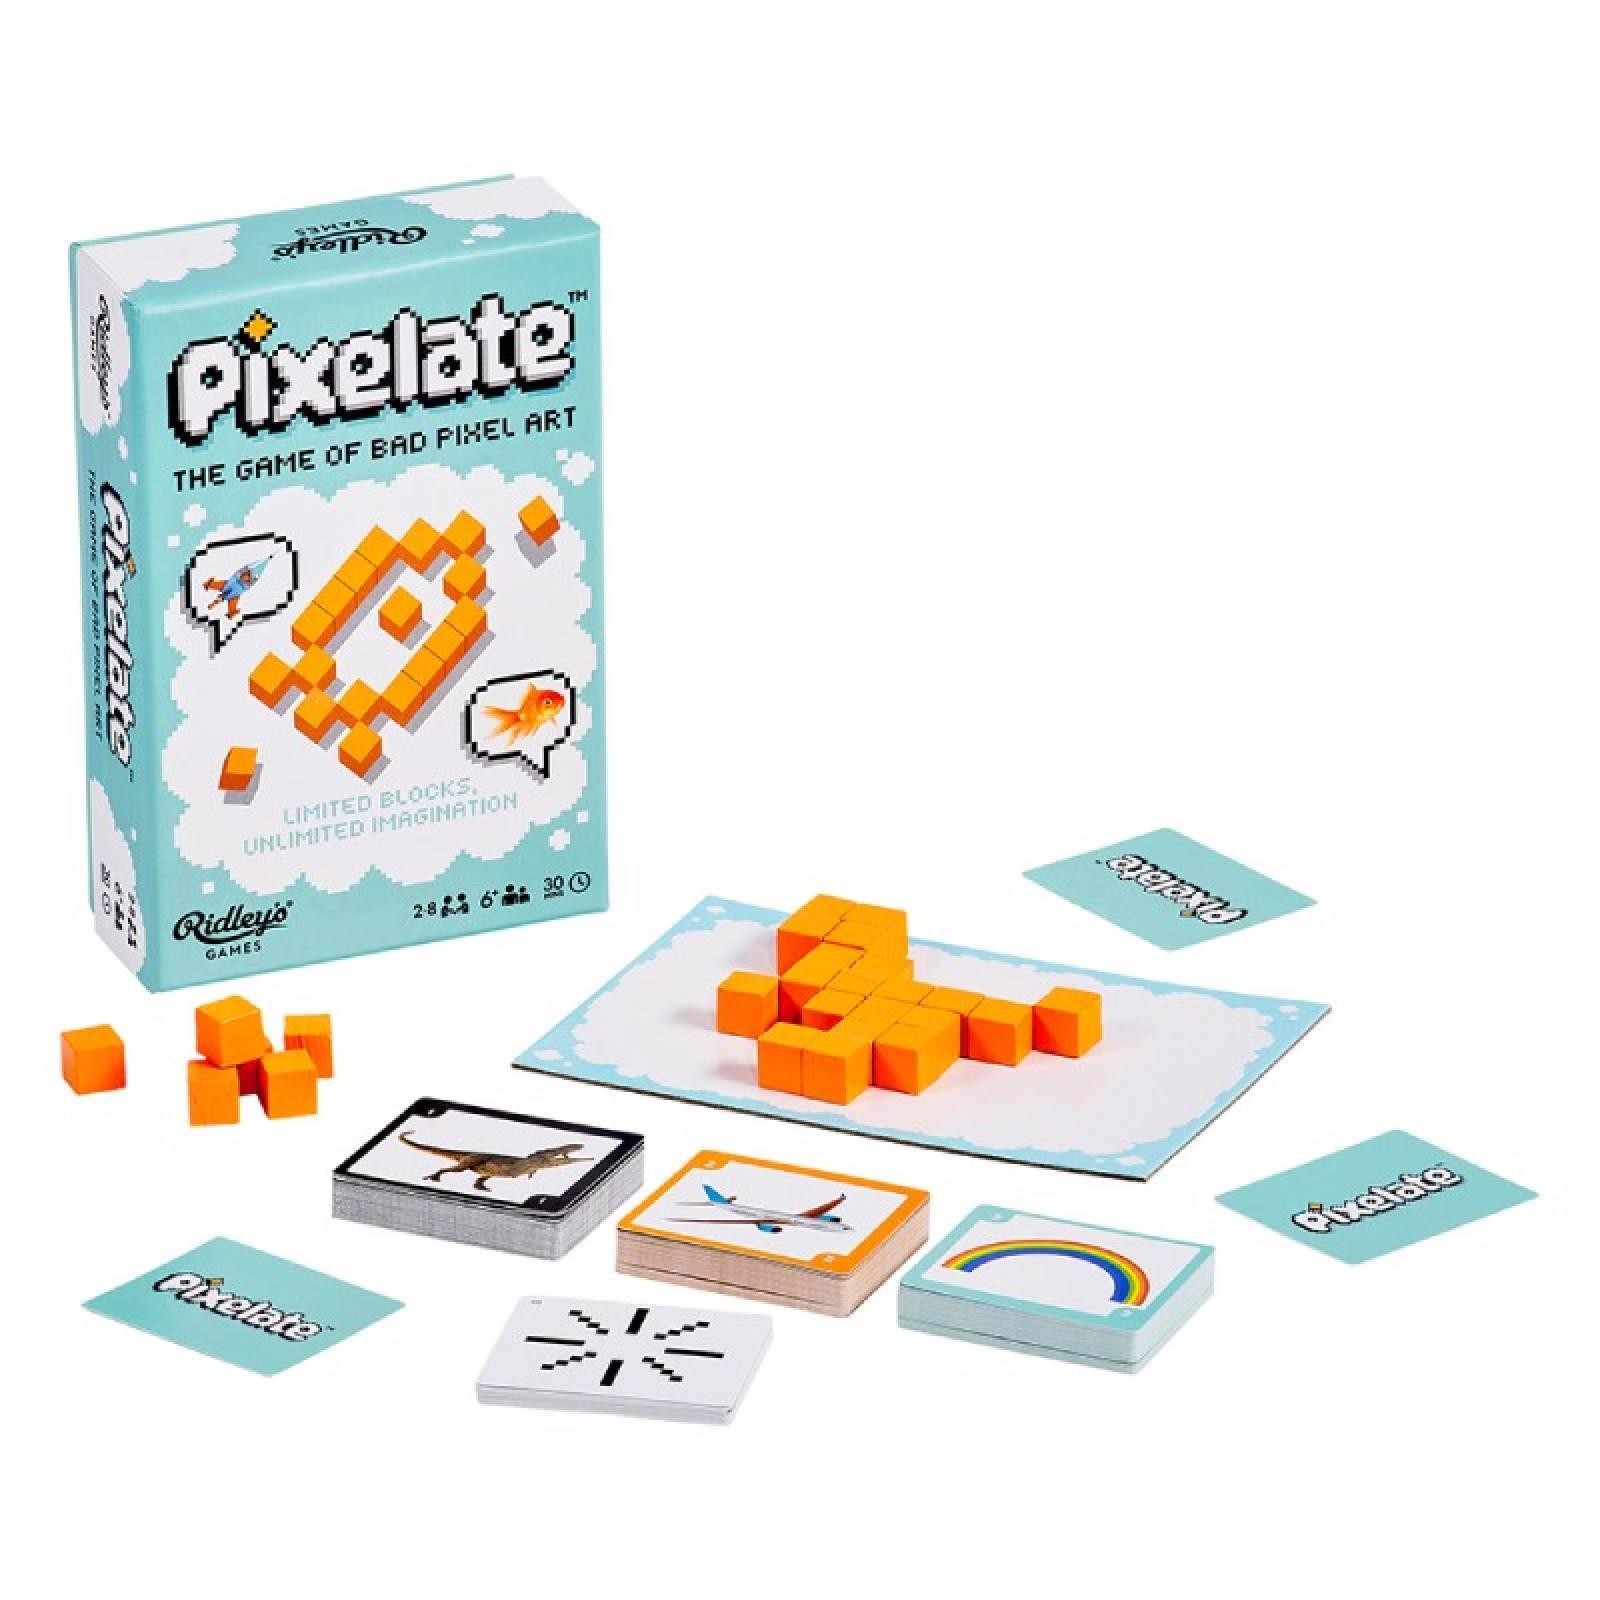 Pixelate - The Game Of Bad Pixel Art 6+